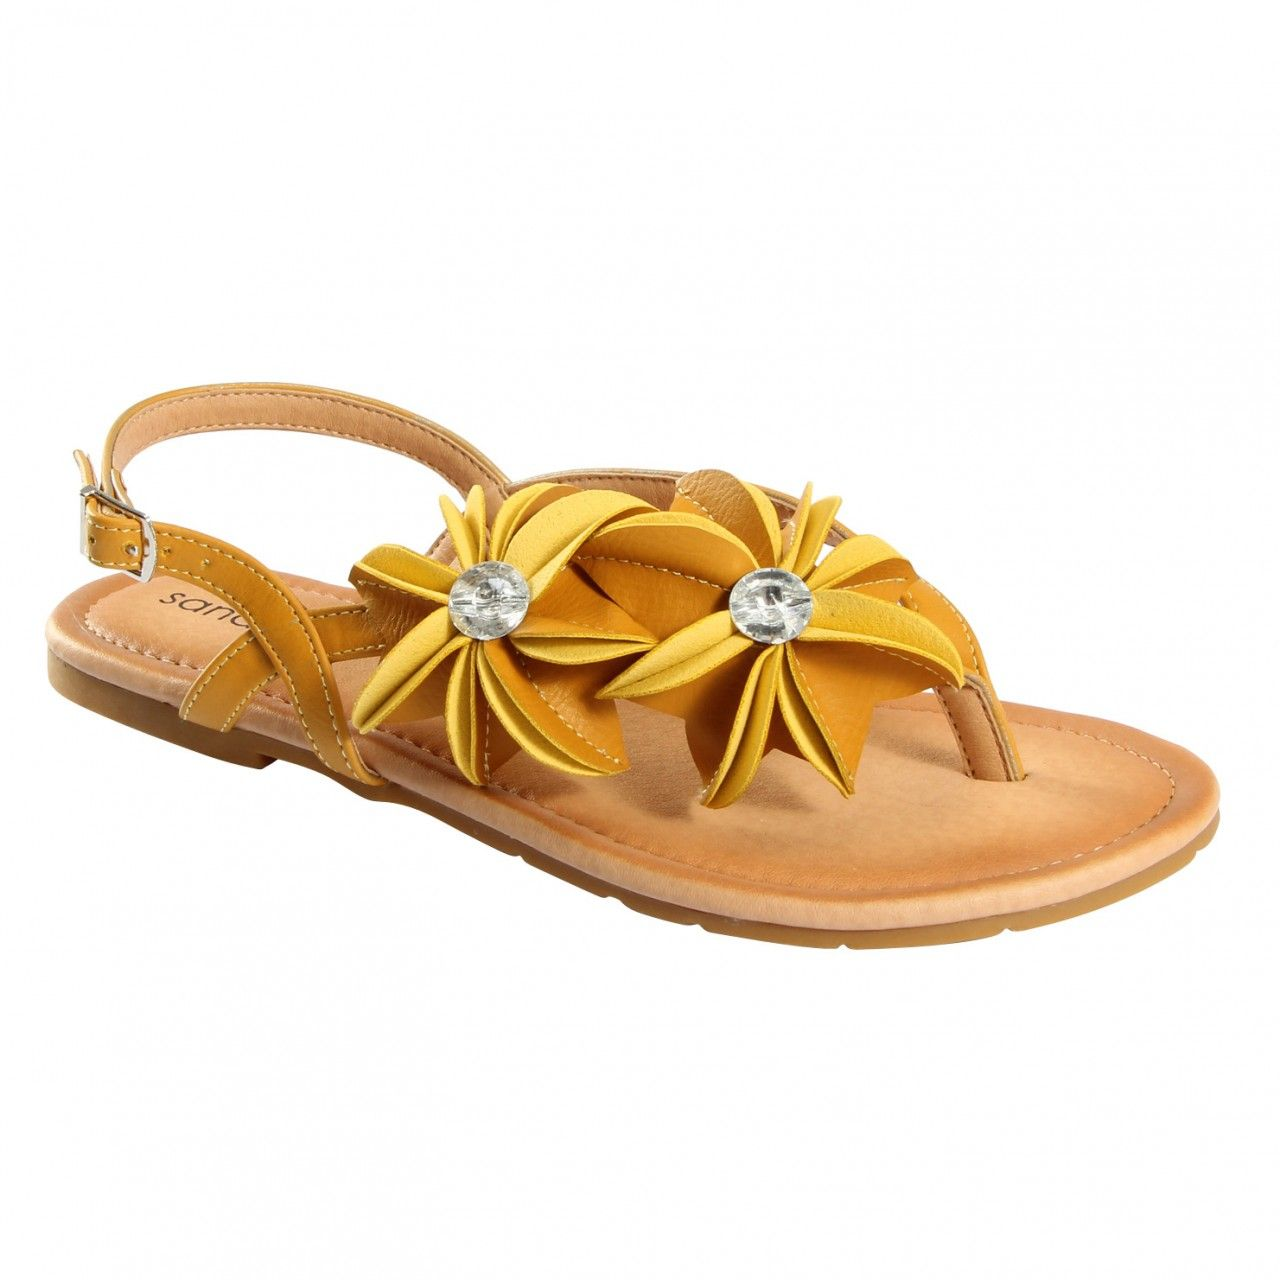 Flat sandals - Fatone Floral Ornament Flat Sandal